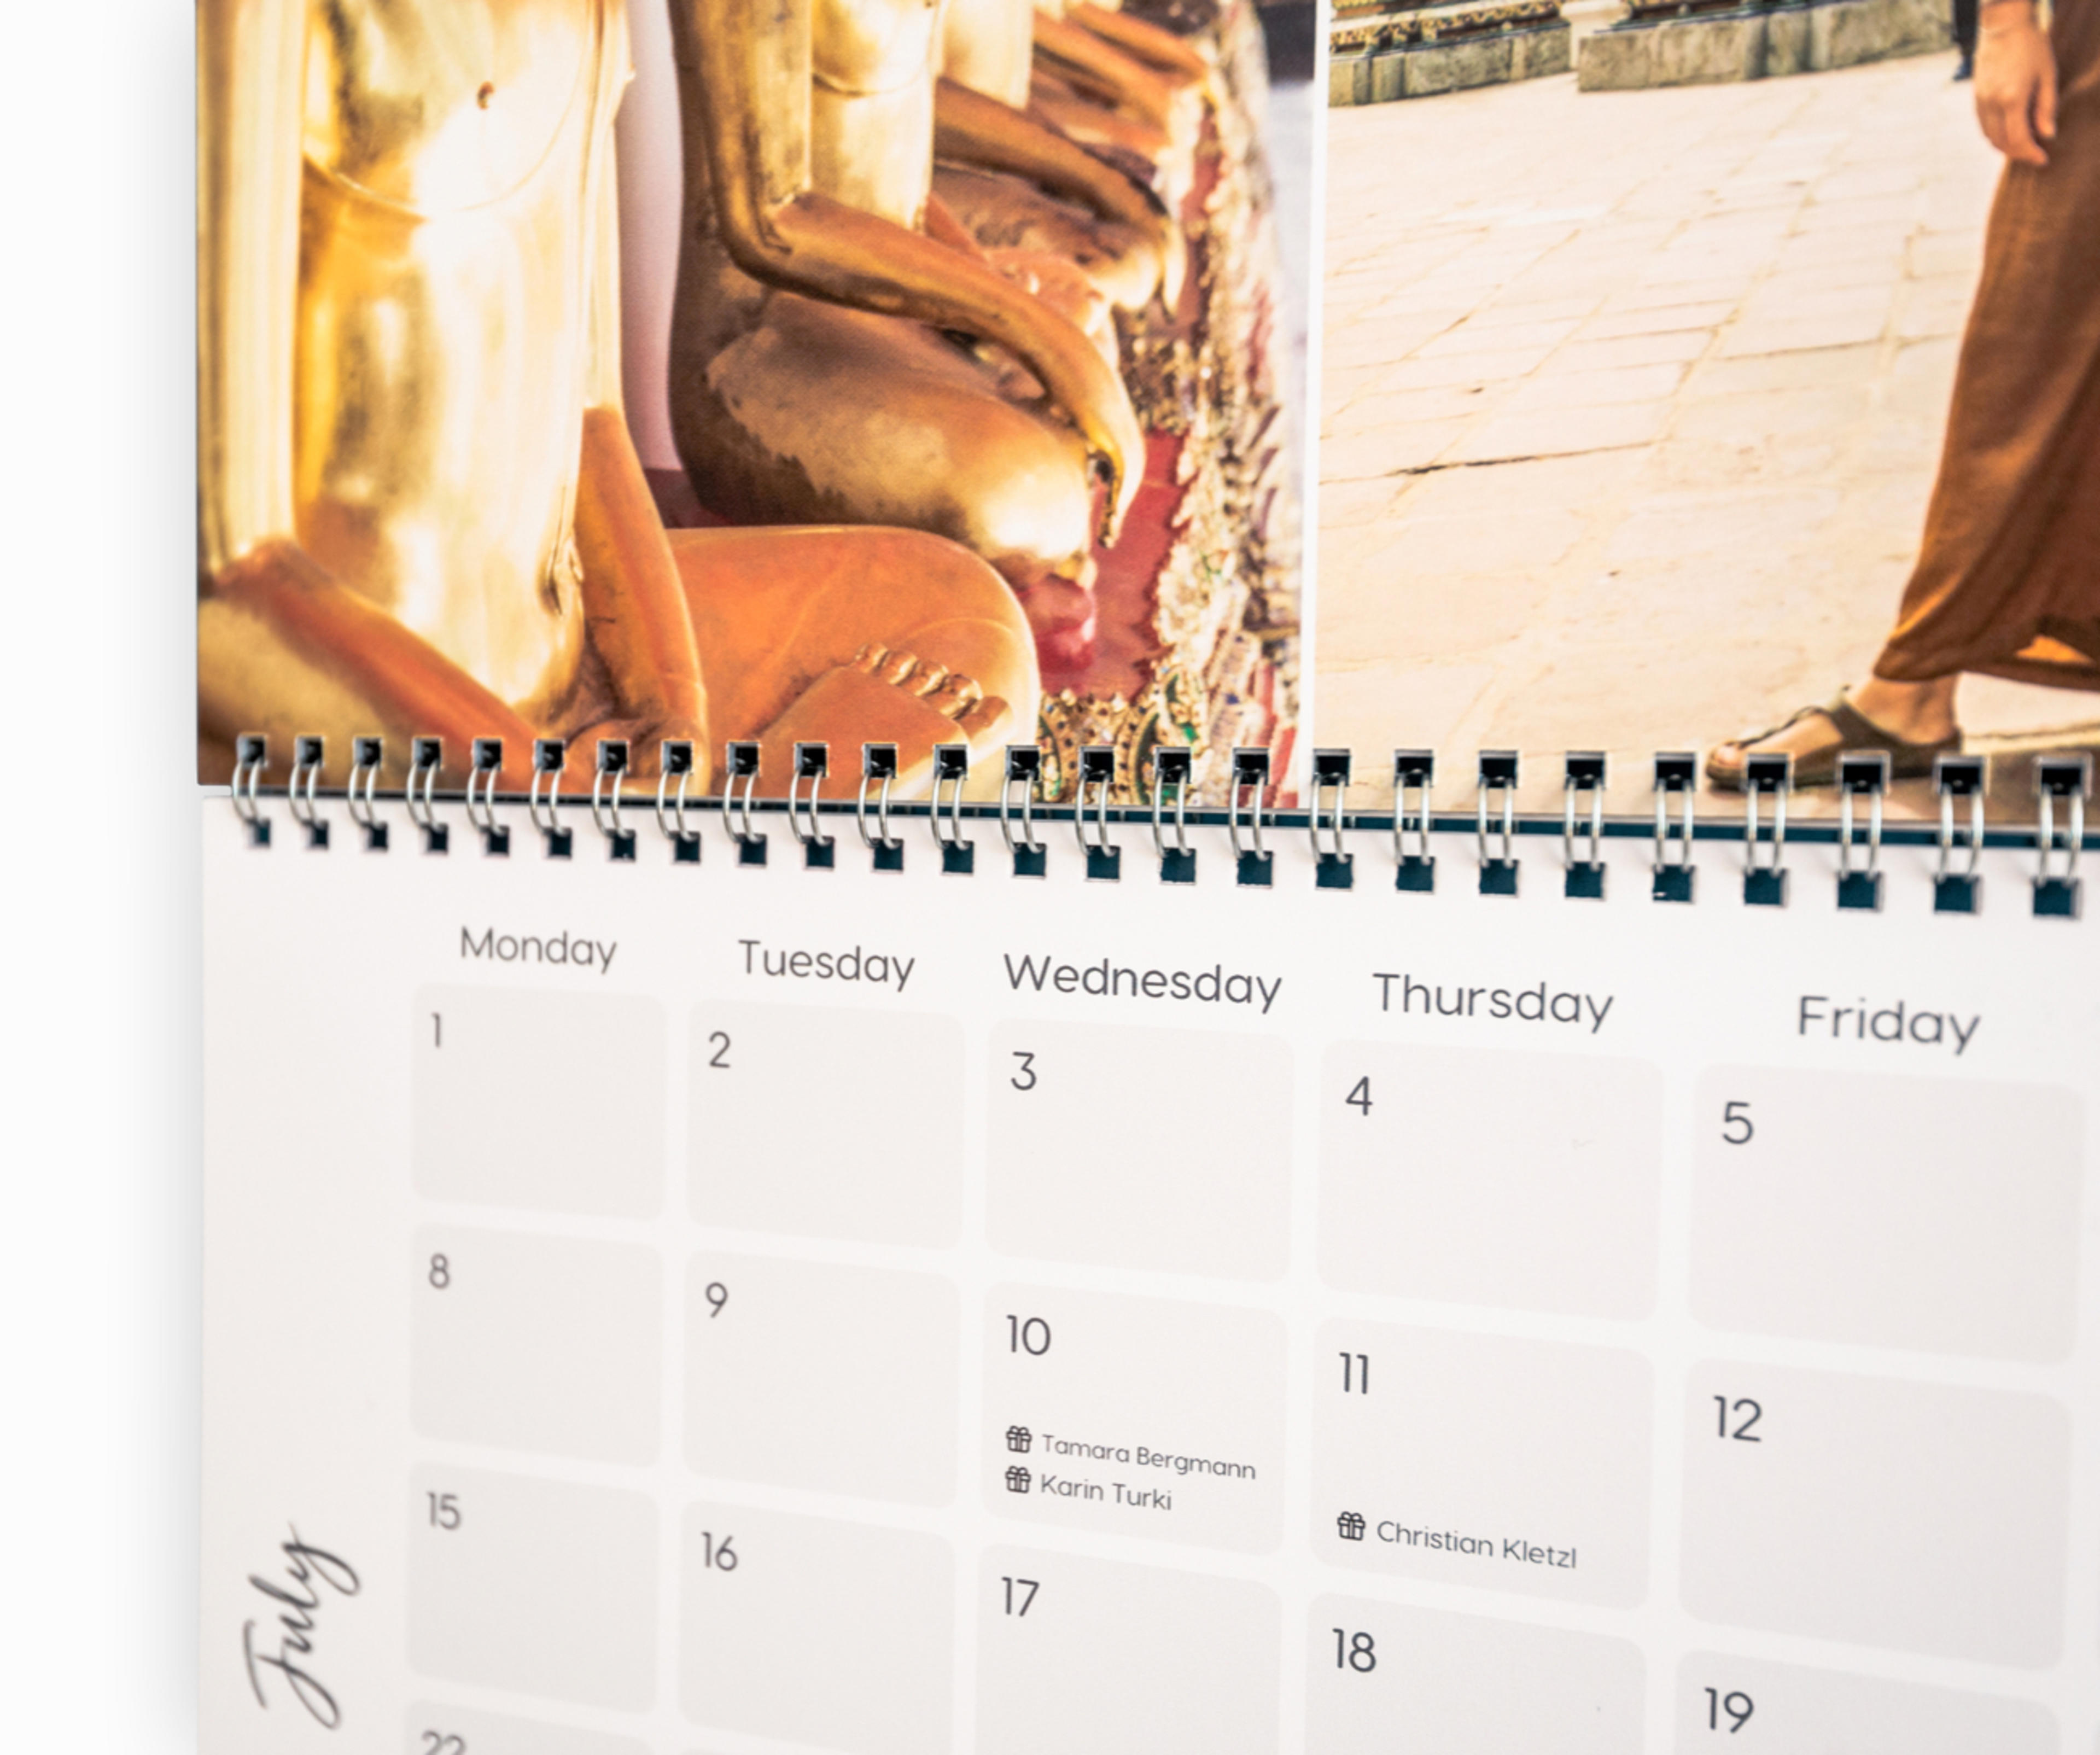 calendar zoom details